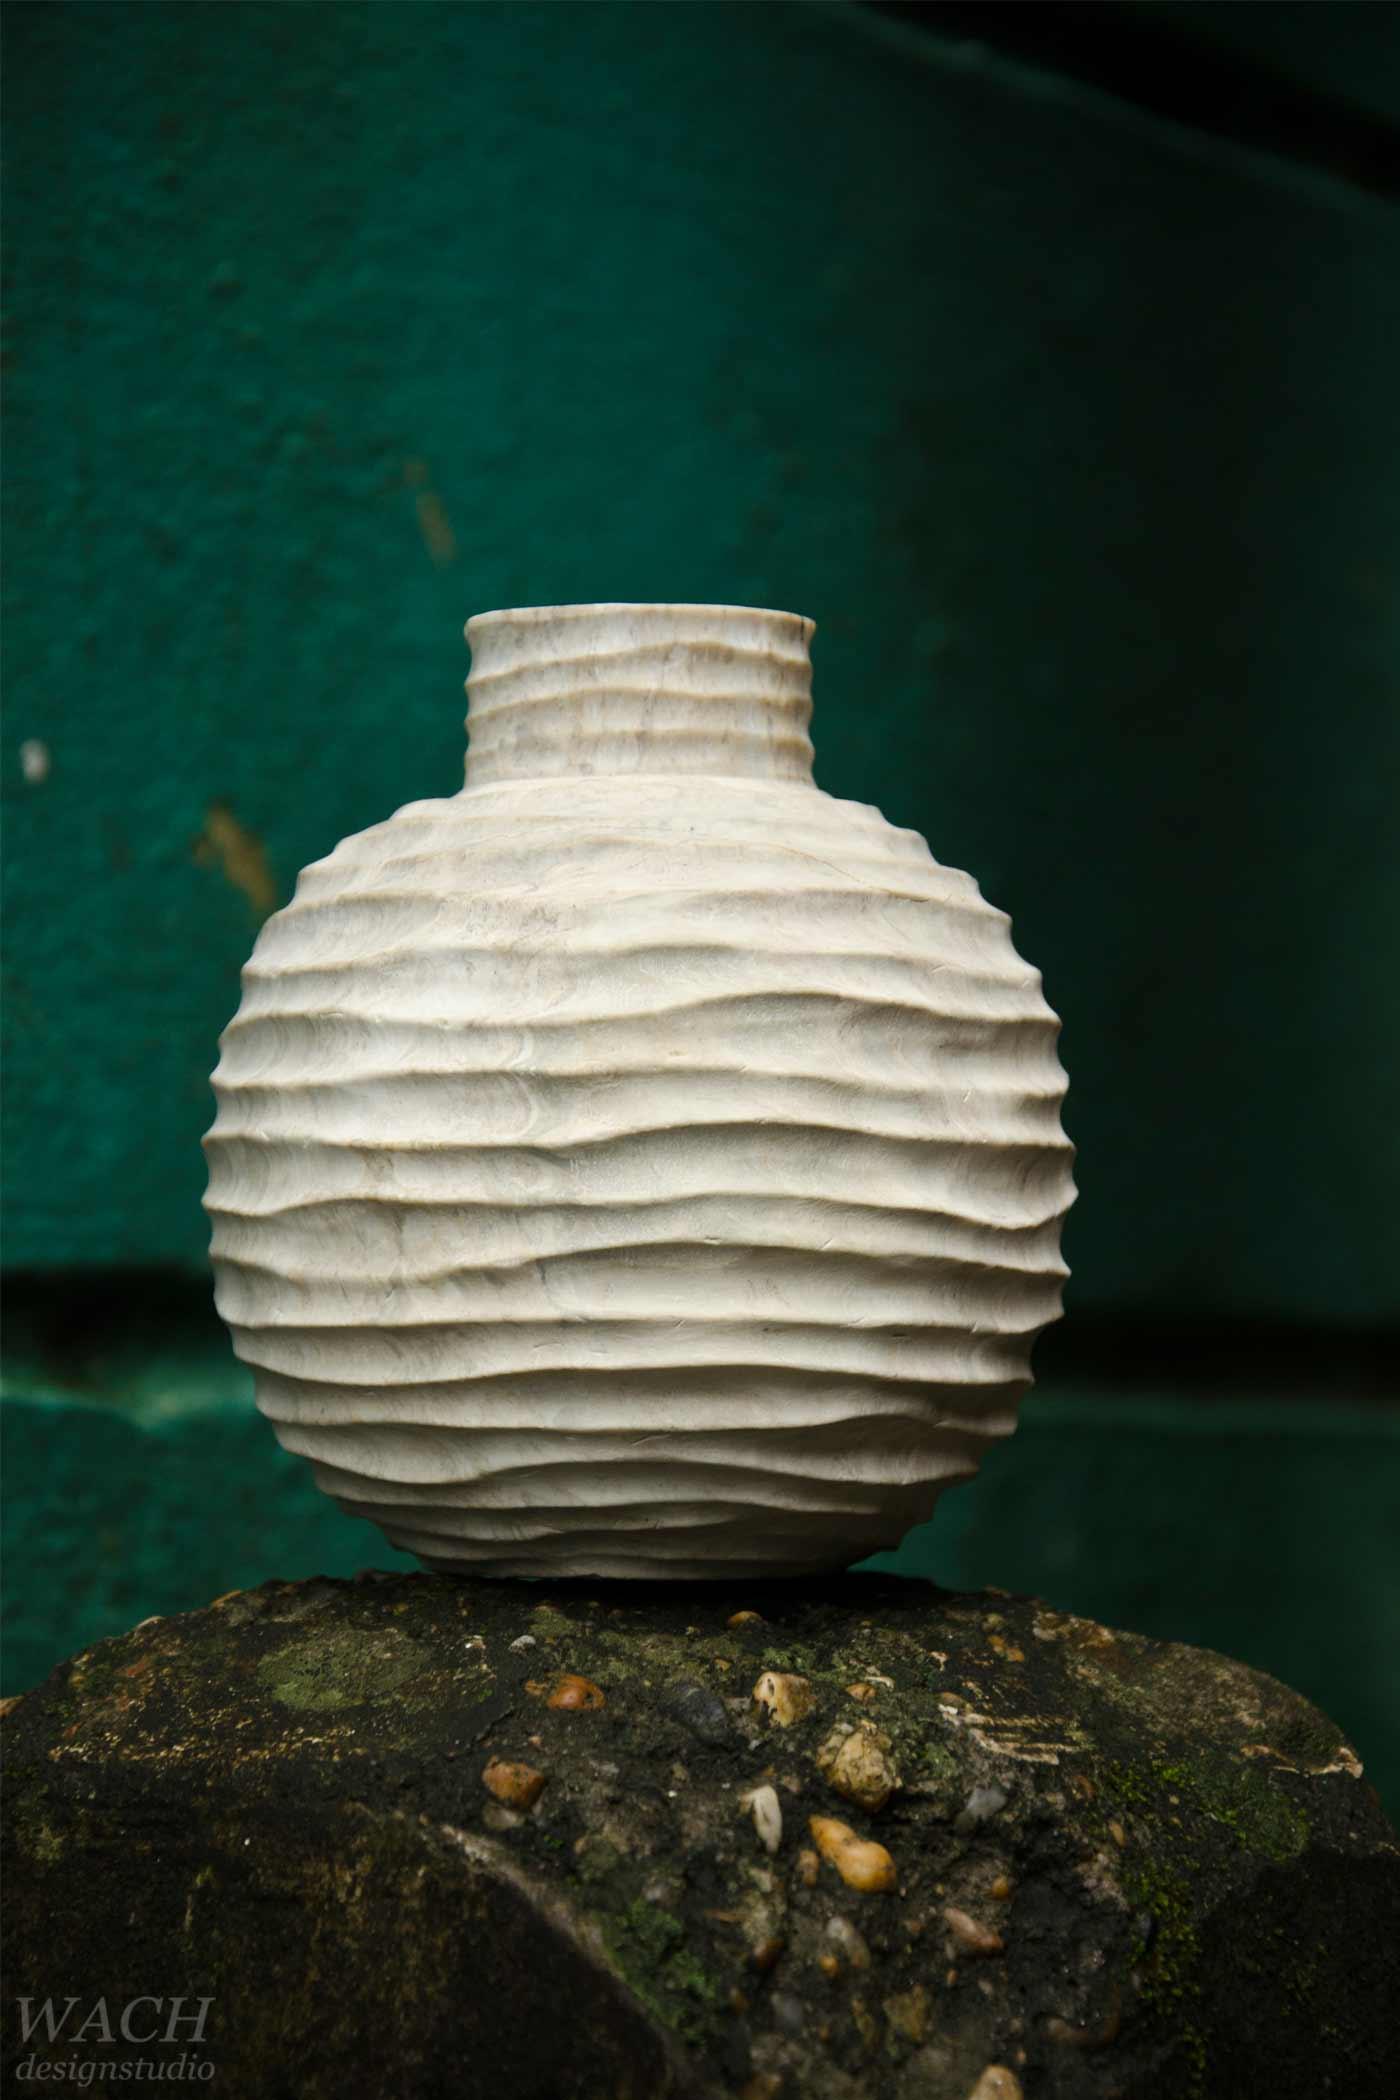 Vietnamese handcrafted stone vase